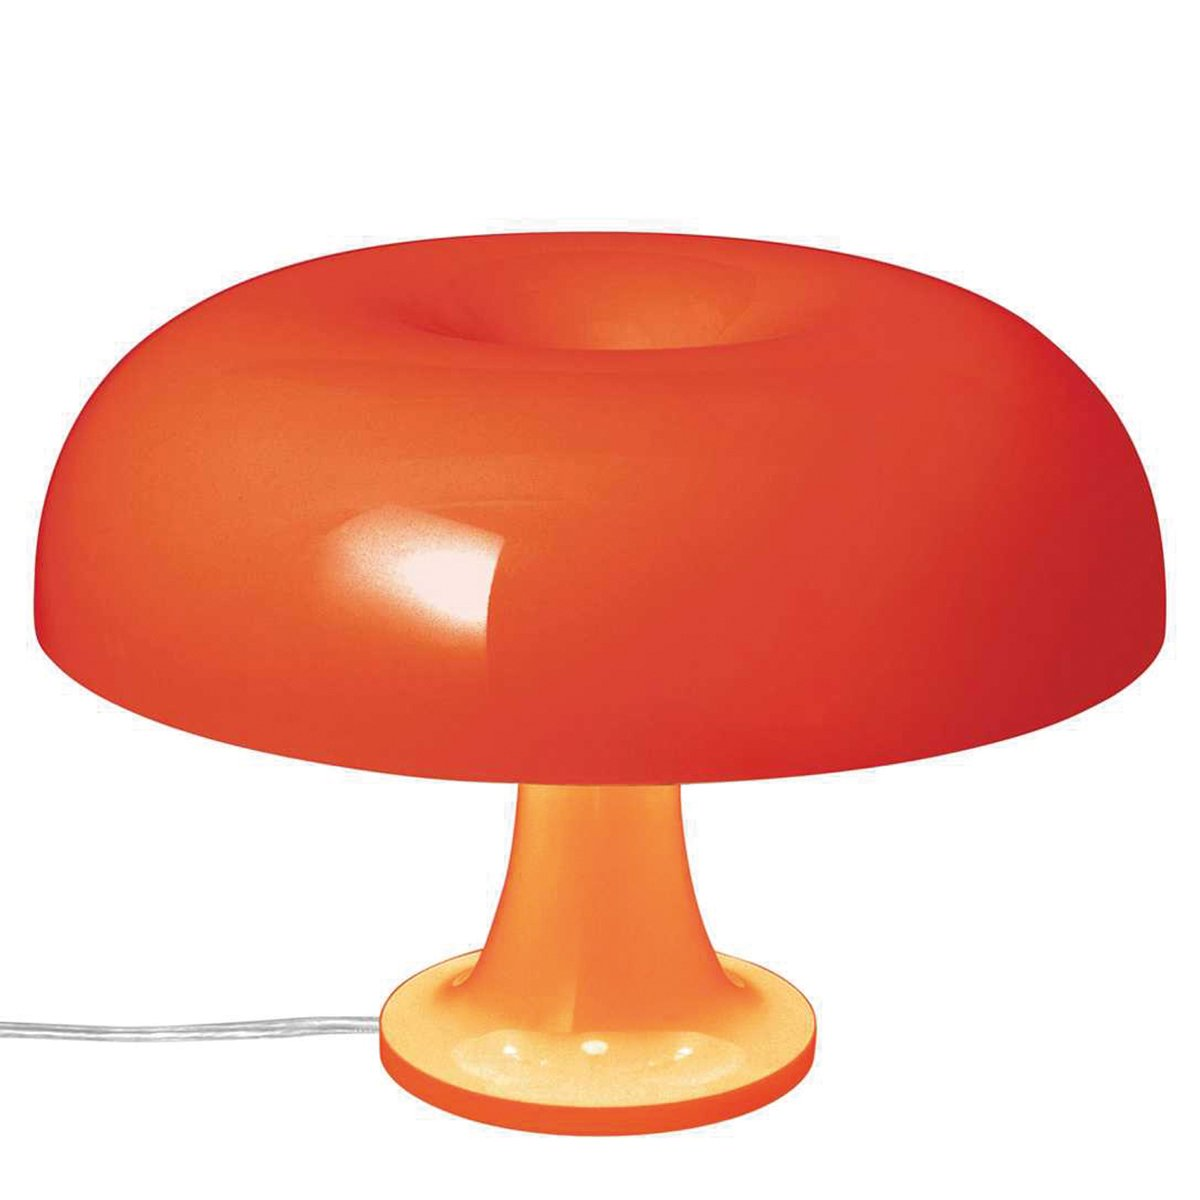 Nessino Tafellamp - Artemide